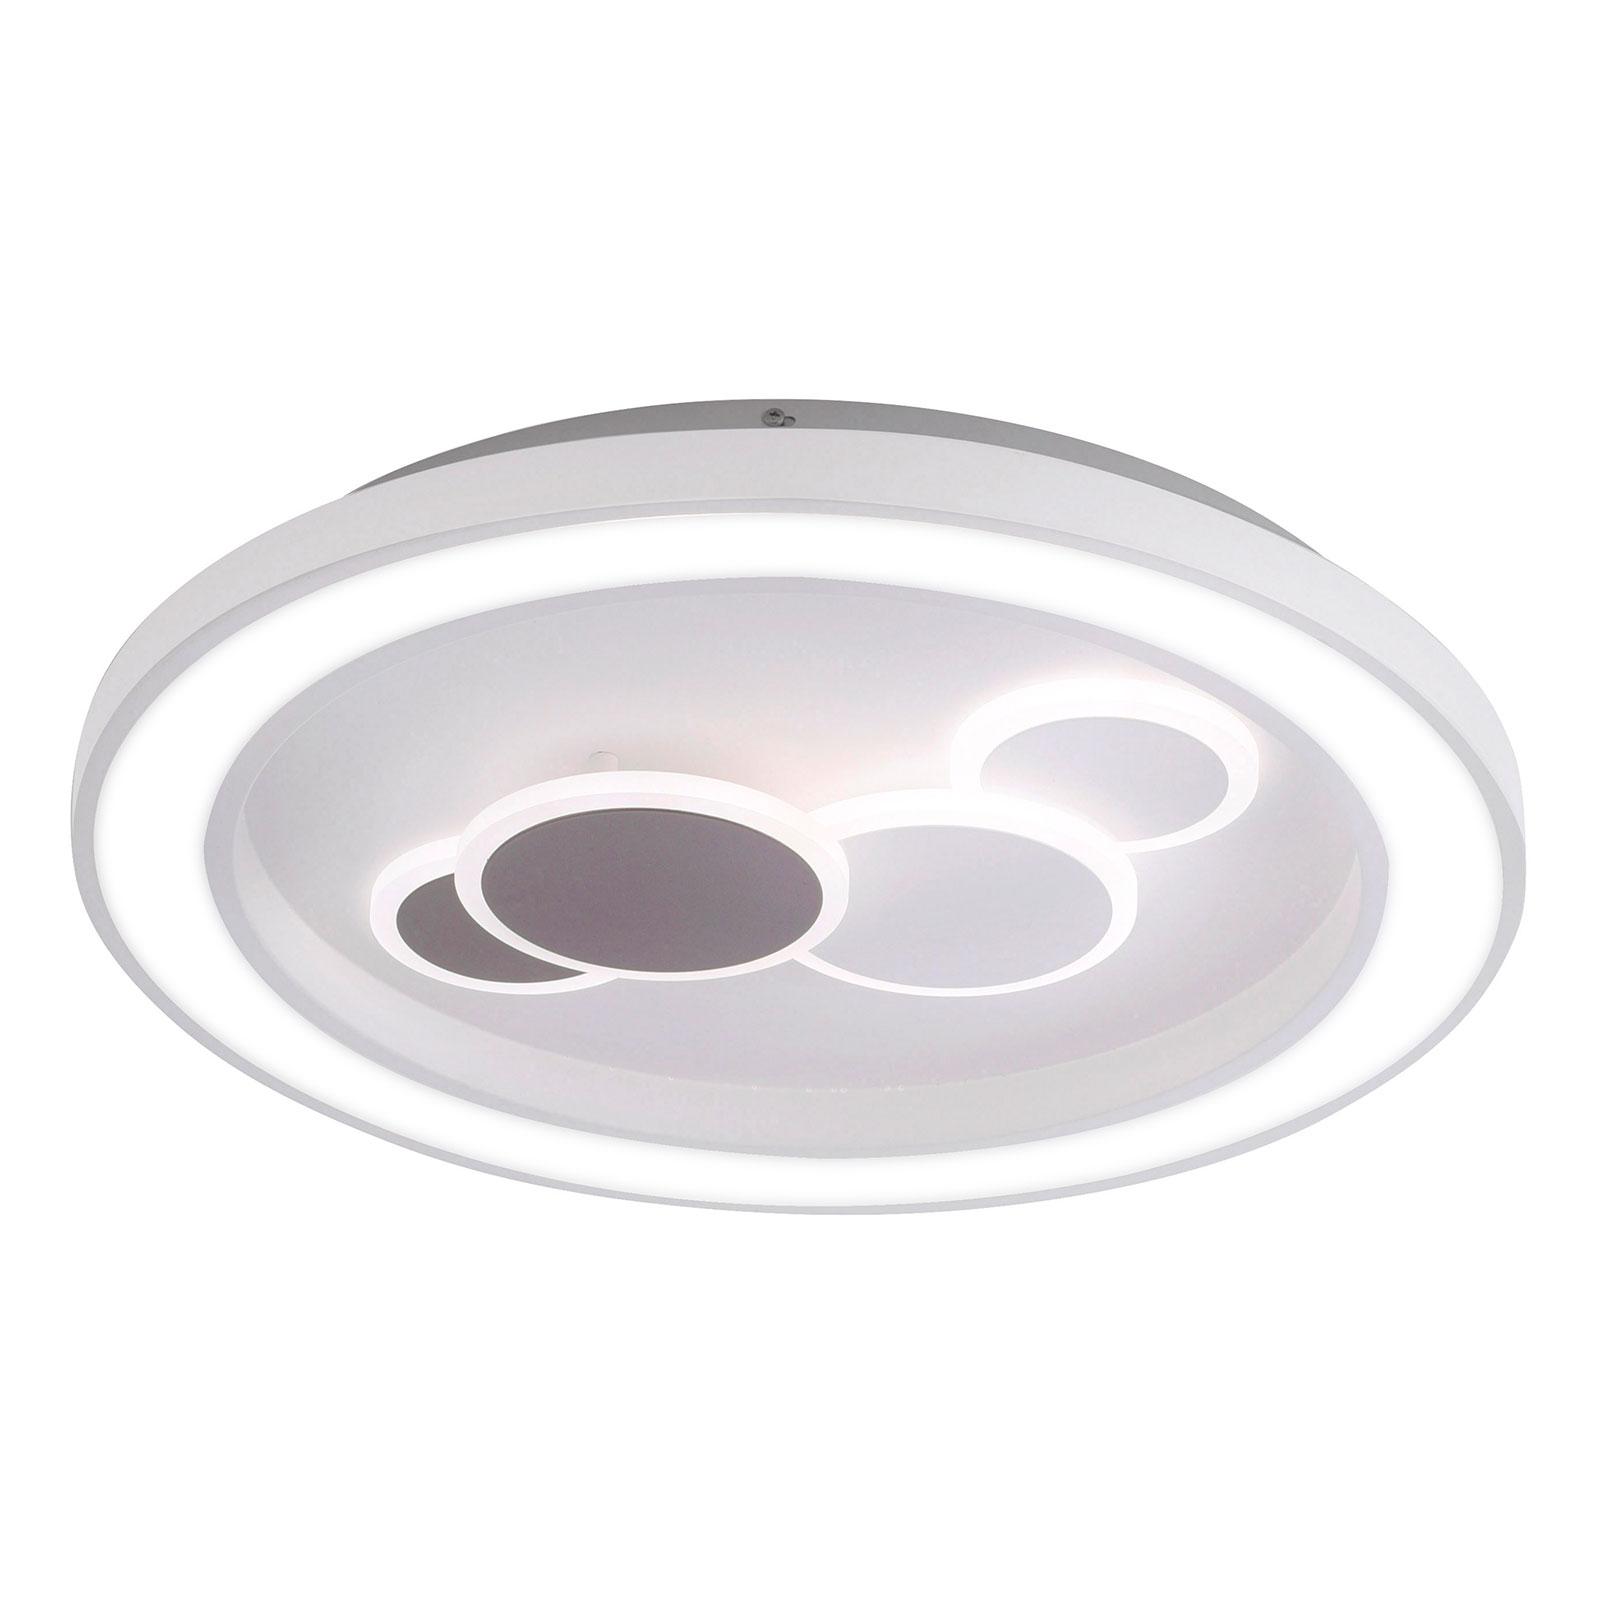 Paul Neuhaus Eliza lampa sufitowa LED okrągła